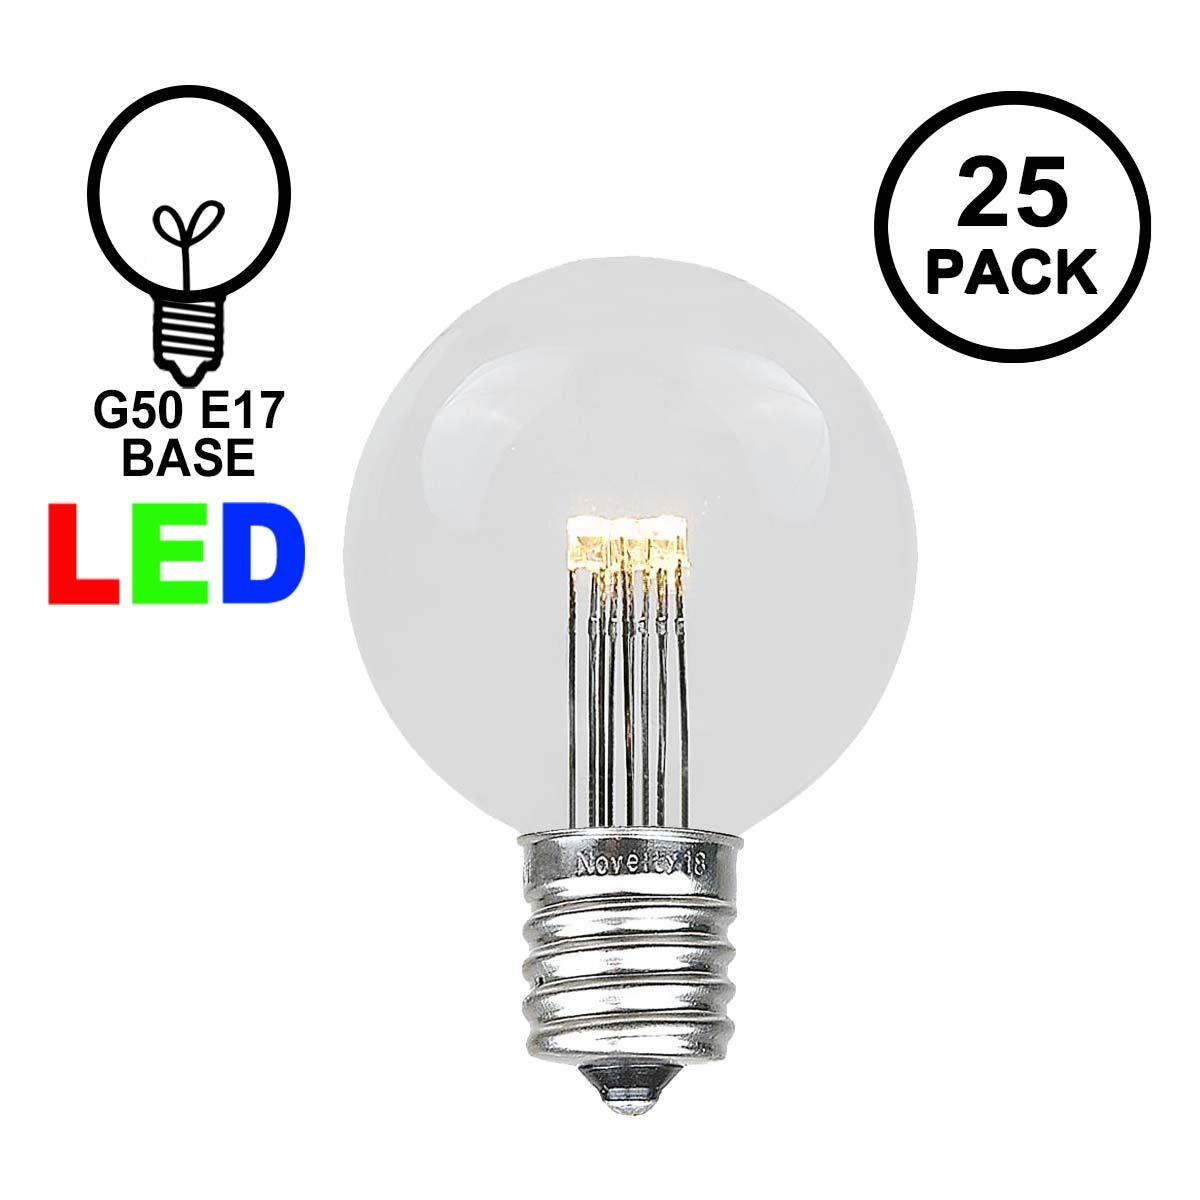 Garden & Patio Outdoor String Lights | Novelty Light, Inc